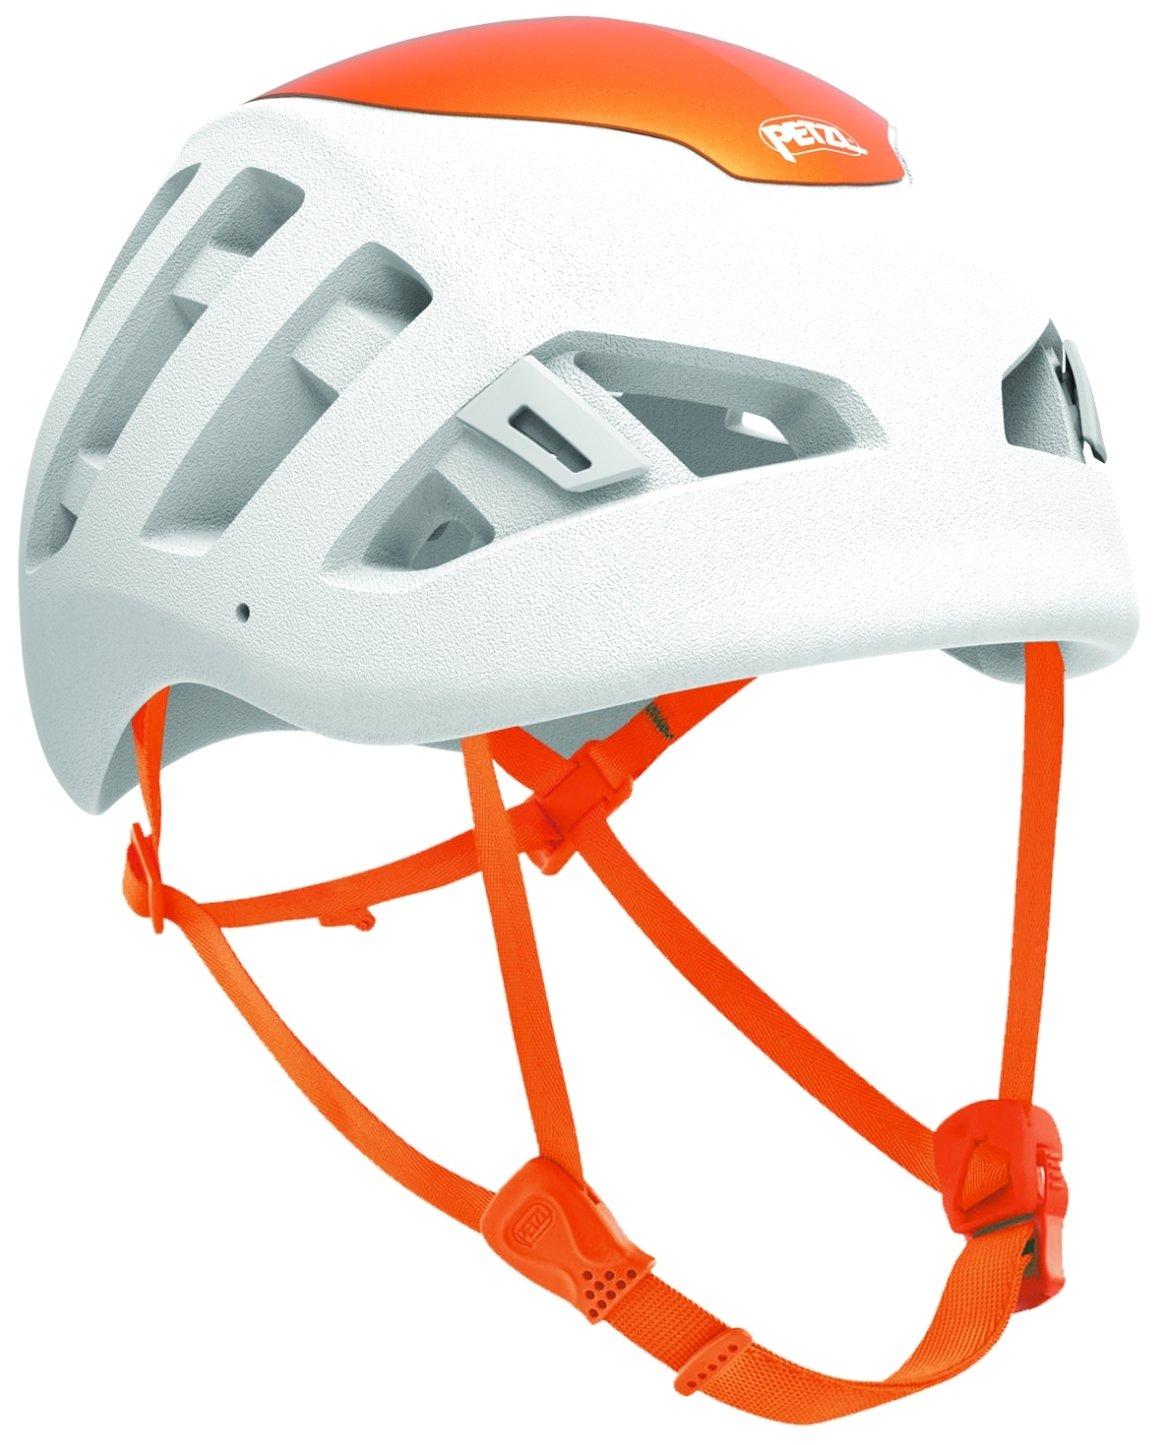 PETZL Unisex– Erwachsene Helmet White Helm Sirocco Weiß/Orange S/M, Mehrfar